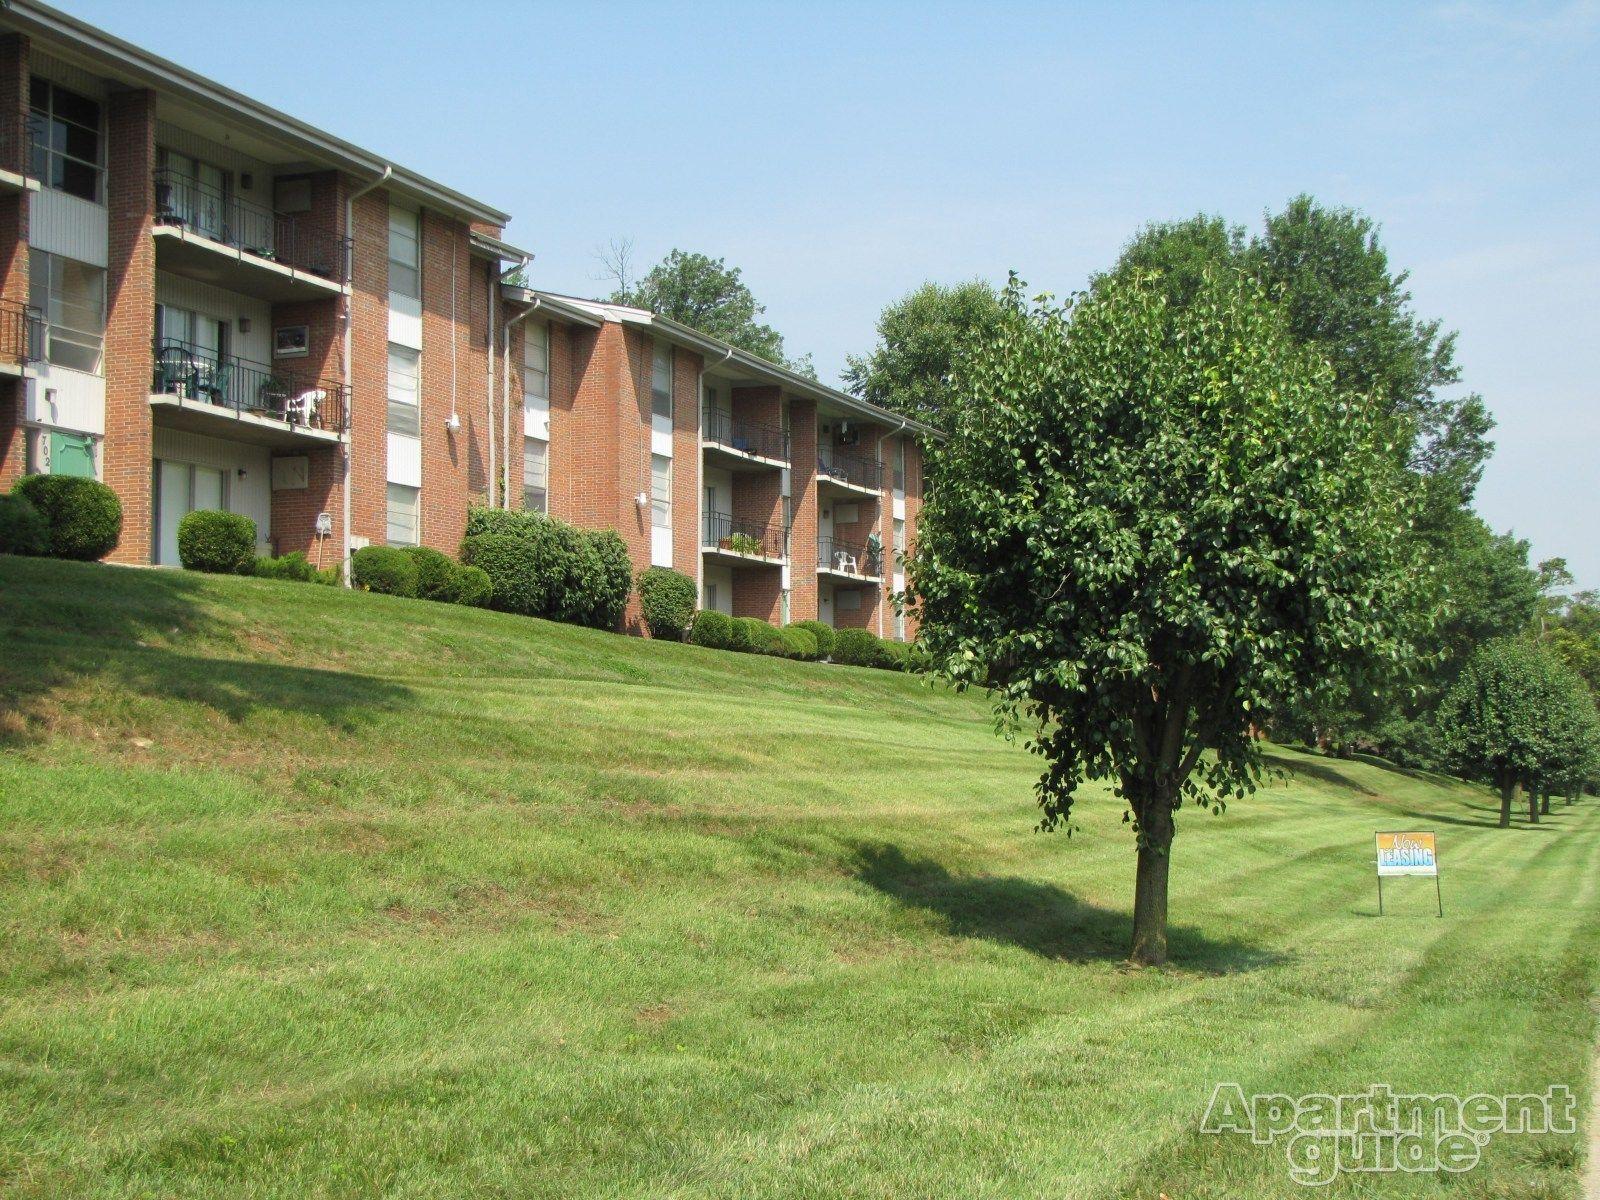 Pin On Apartments Louisville Ky